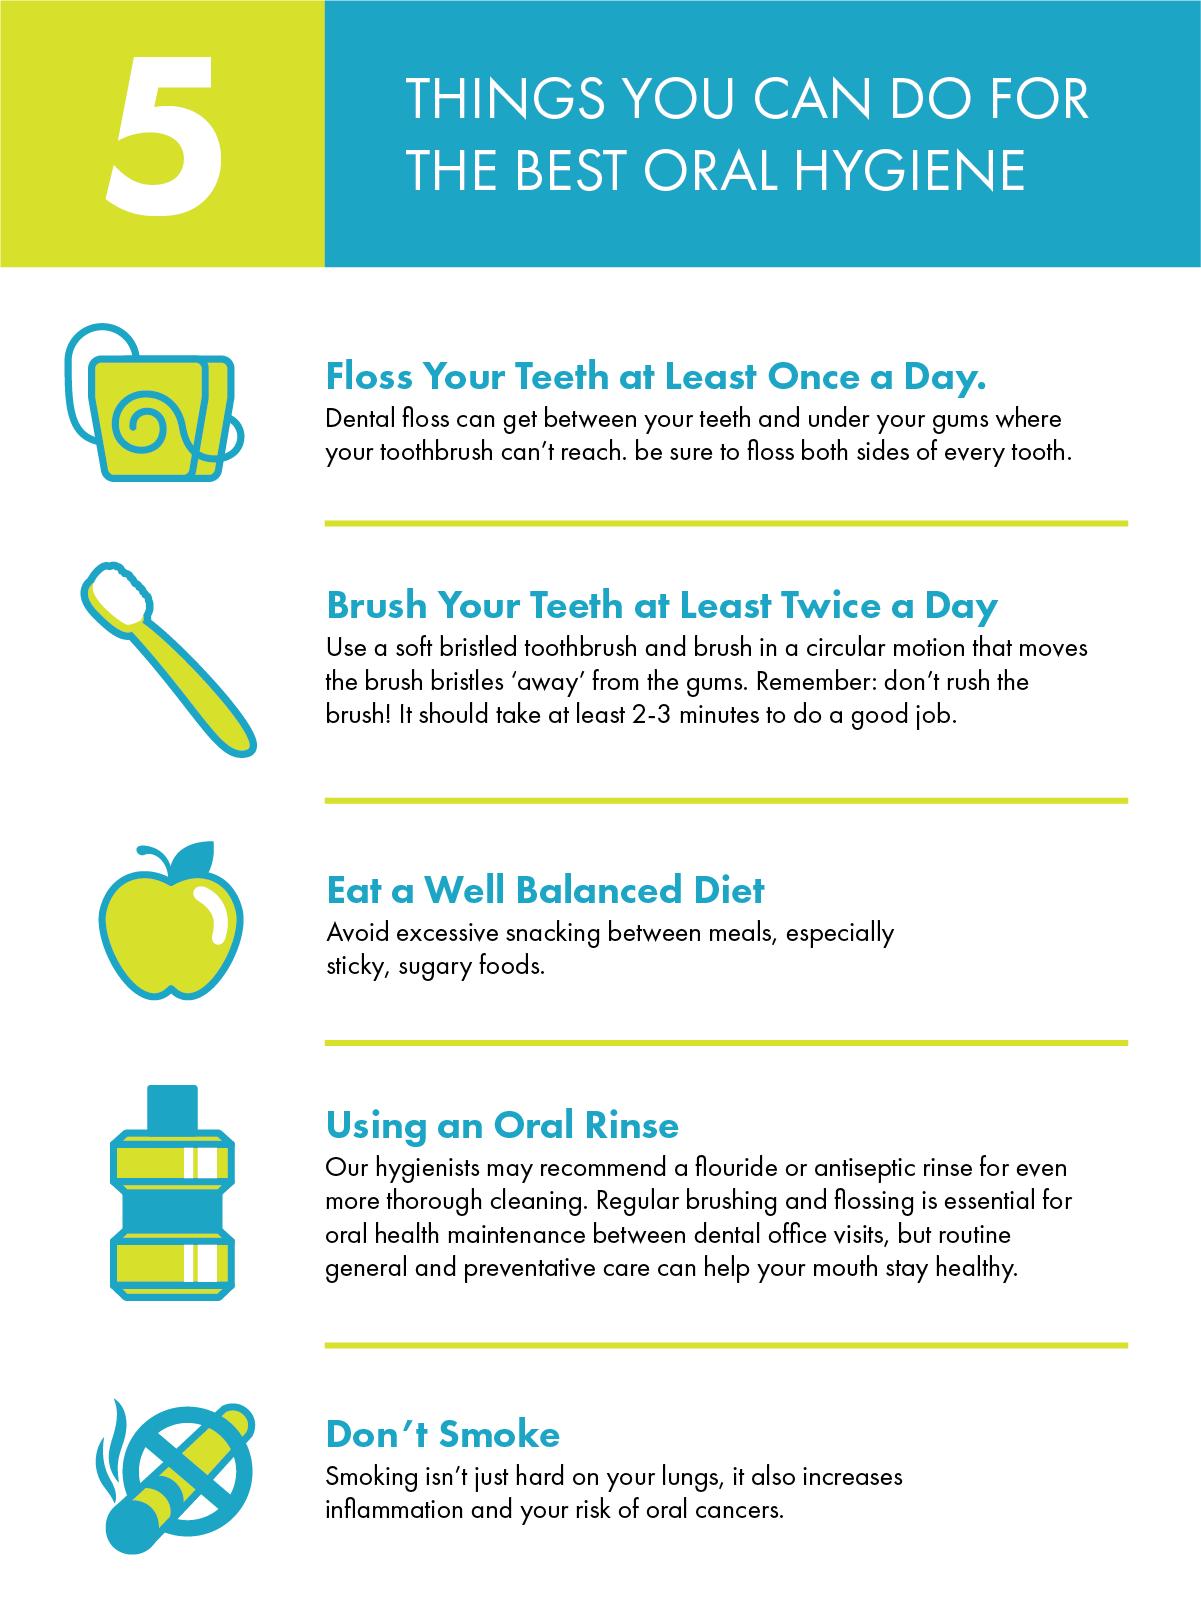 pim-dental-infographic-1-01